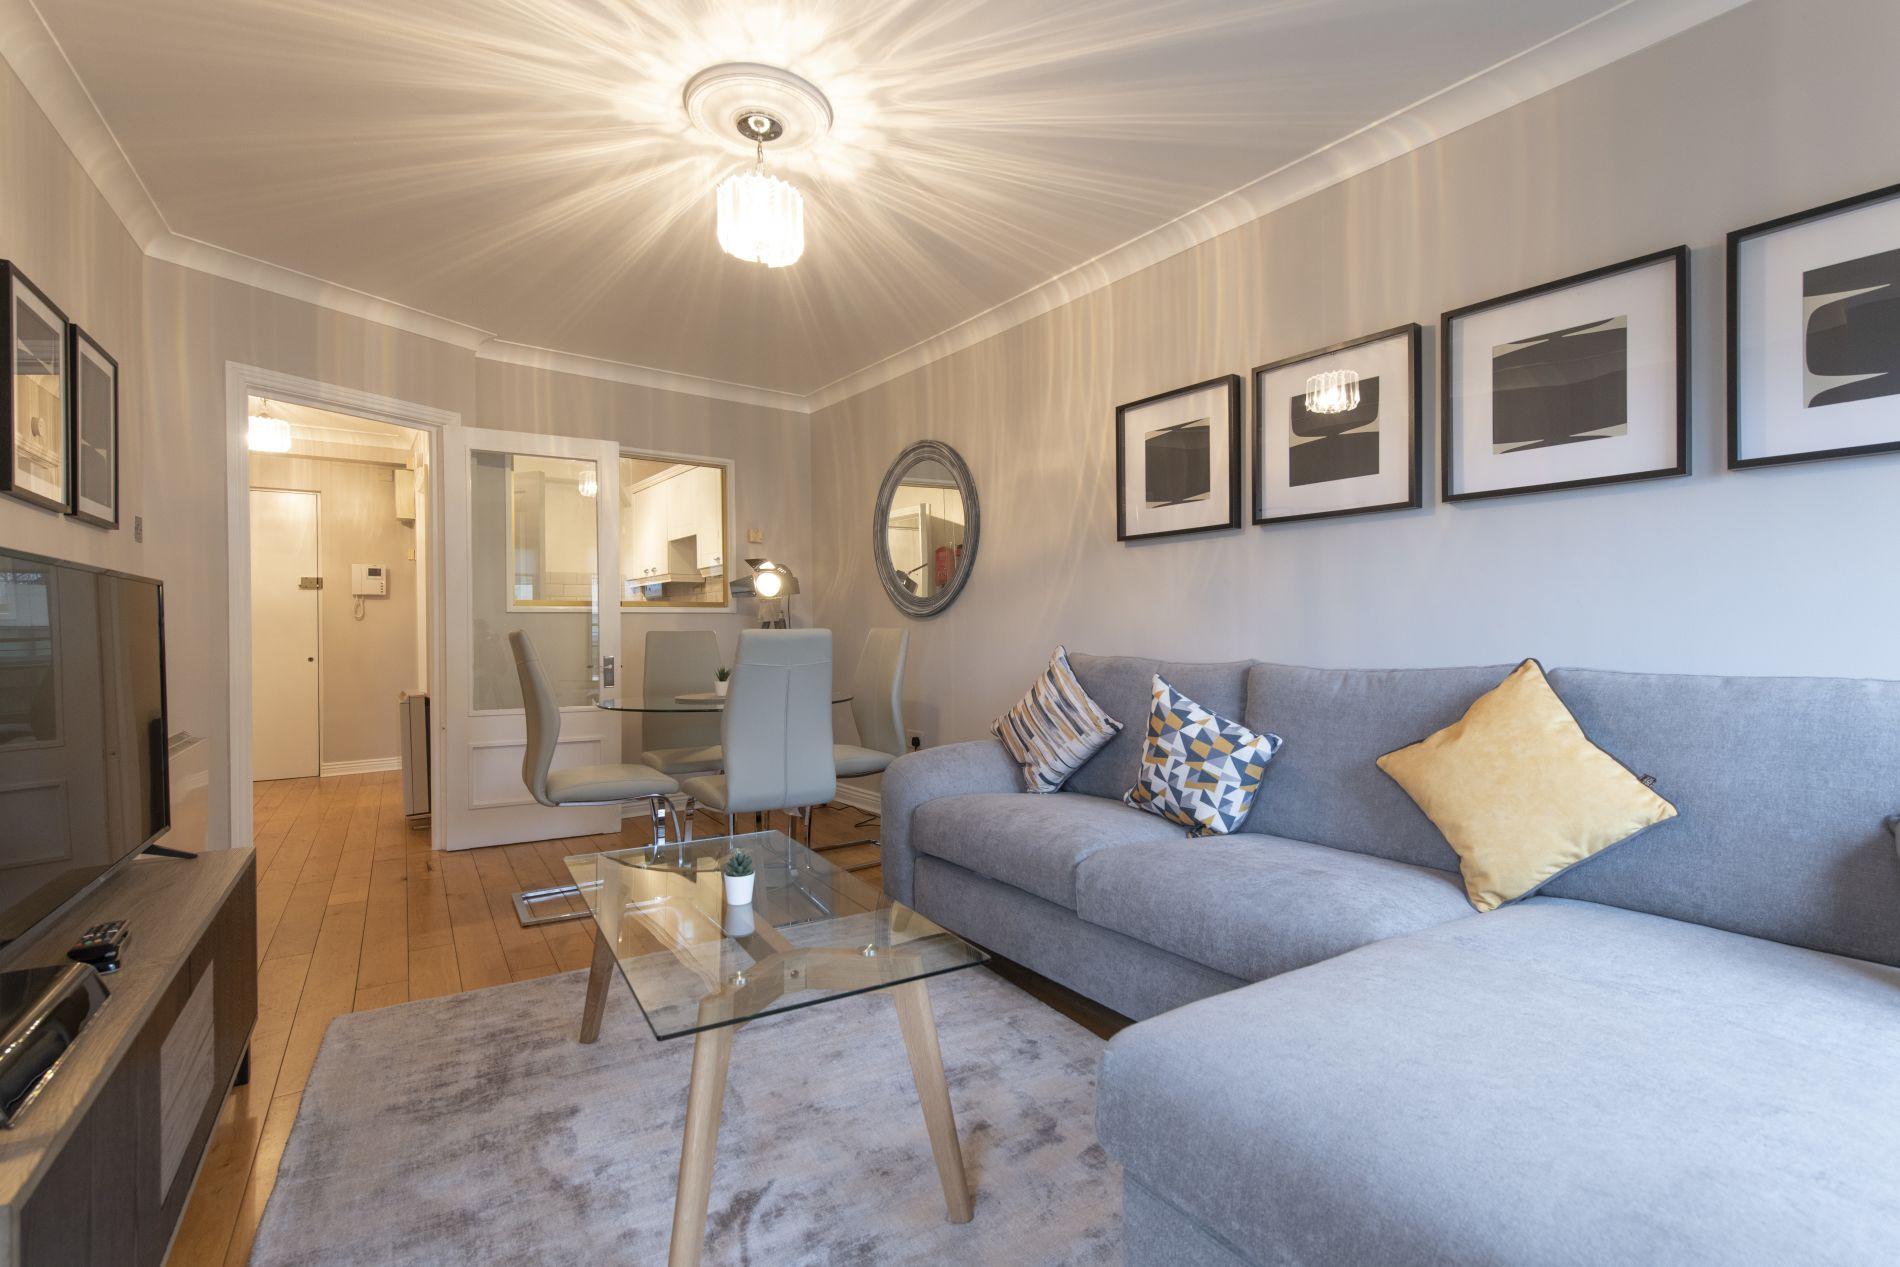 1 Bedroom serviced apartment in Ballsbridge district of Dublin